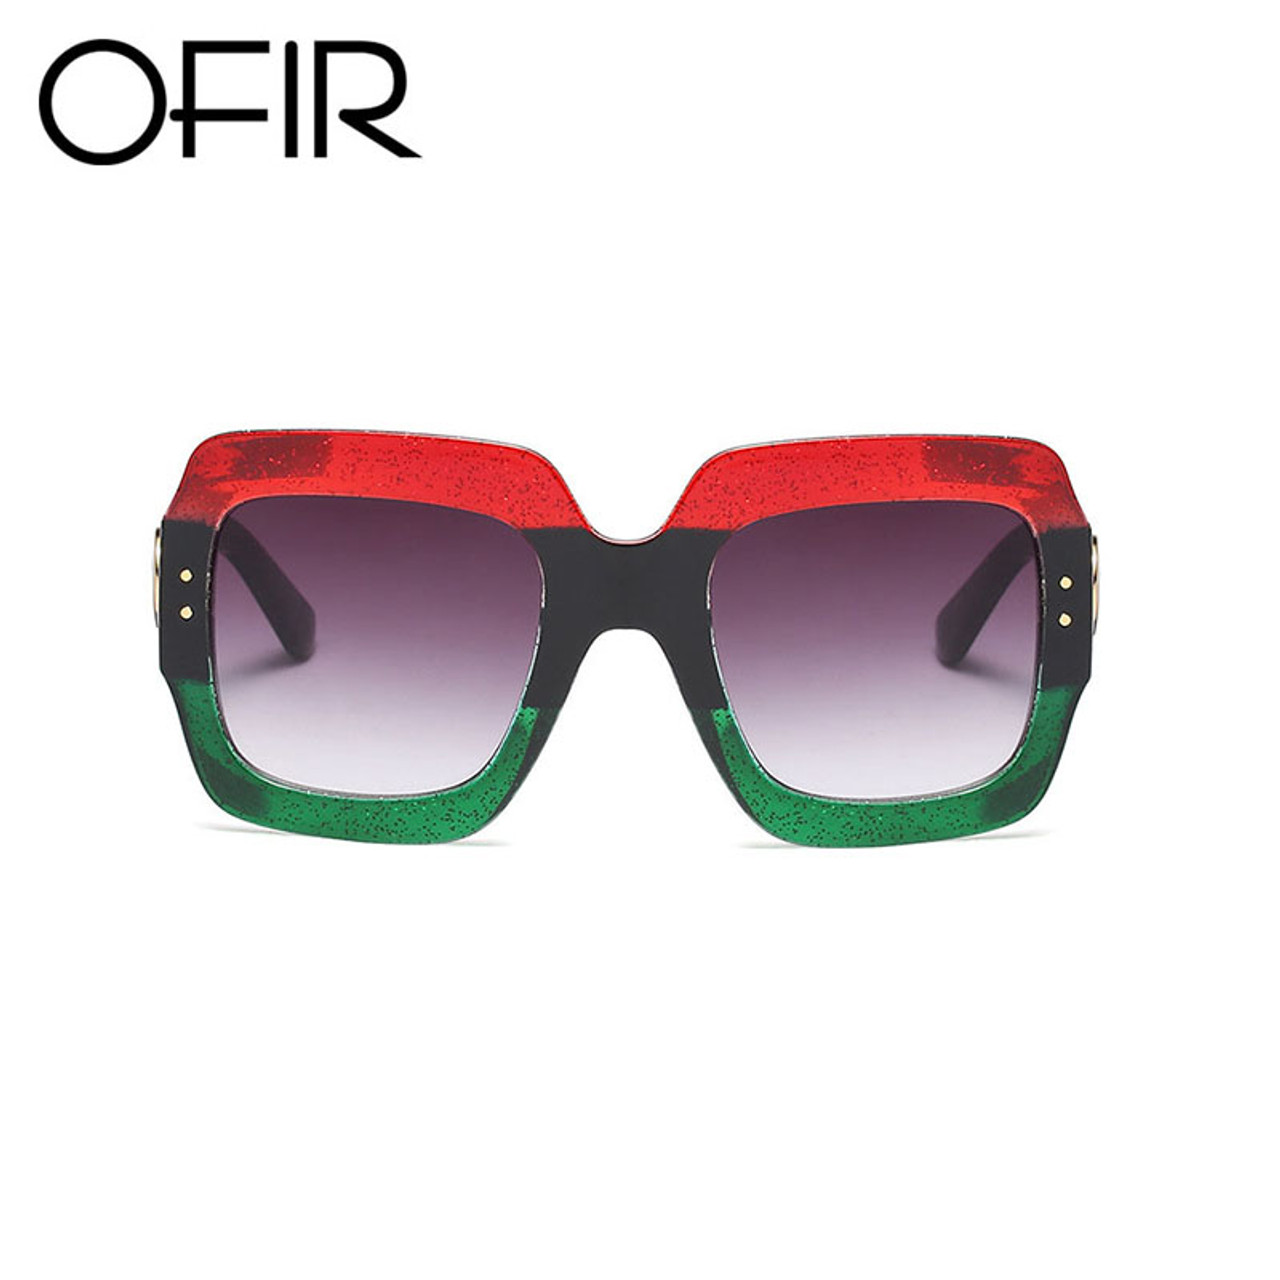 80ff69b5e9 ... OFIR 2018 Newest Oversized Square Sunglasses Women Luxury Brand  Designer Red Green Sun Glasses Female Vintage ...